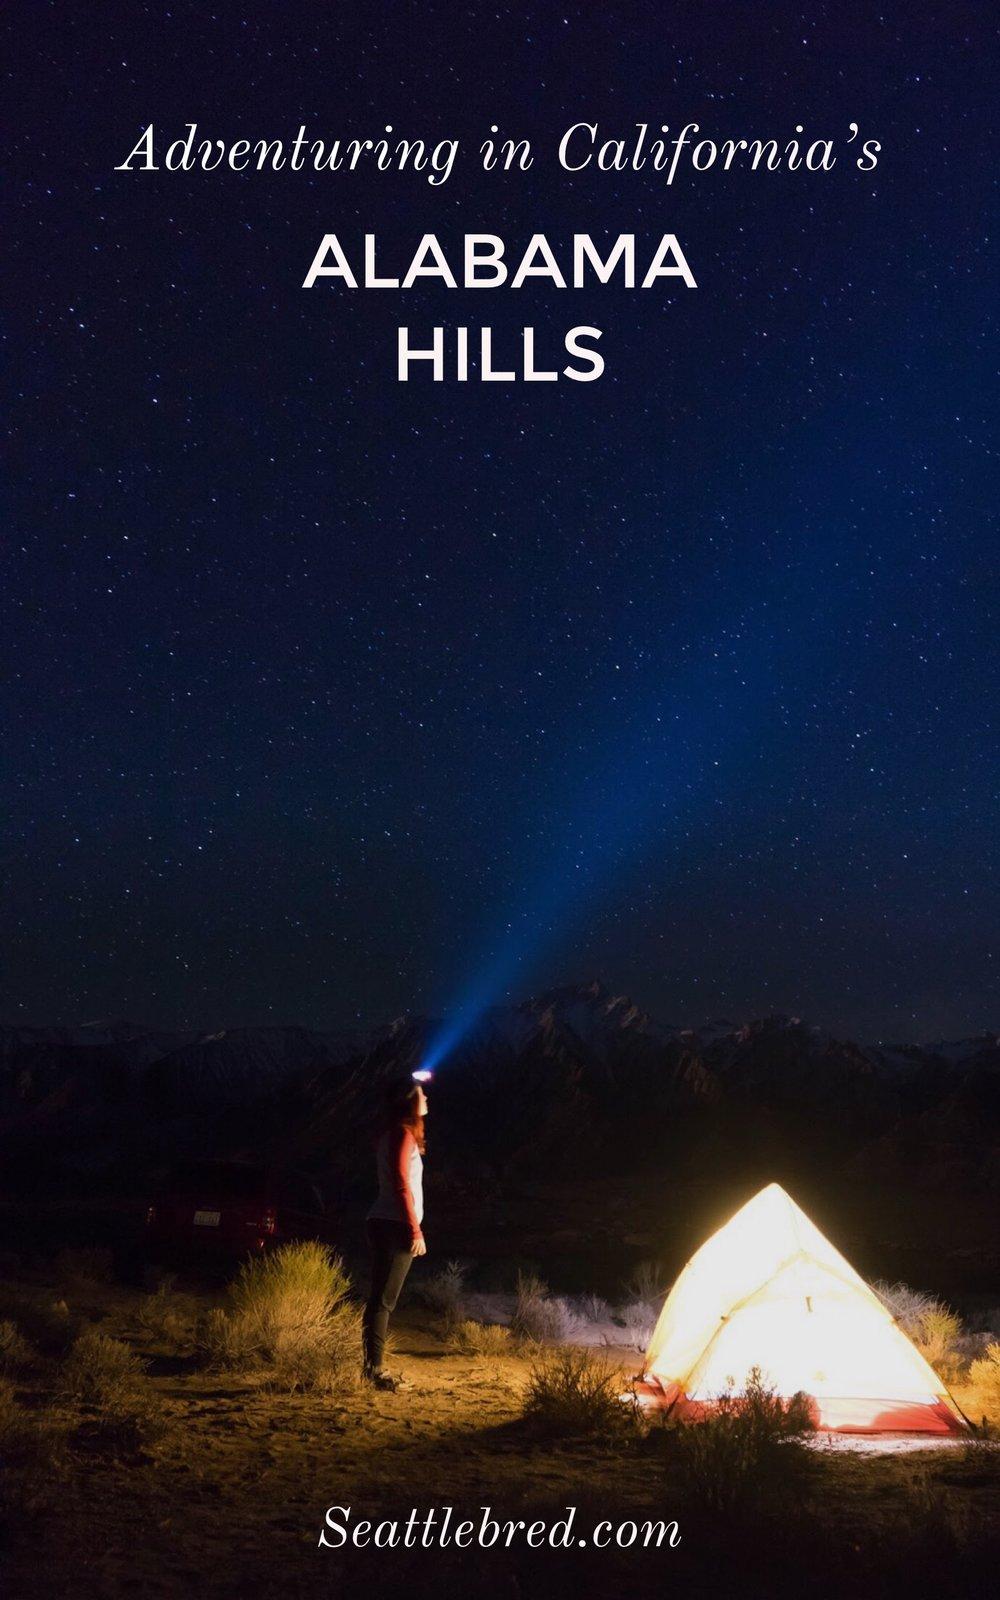 Adventuring-in-Californias-Alabama-Hills-10.JPG